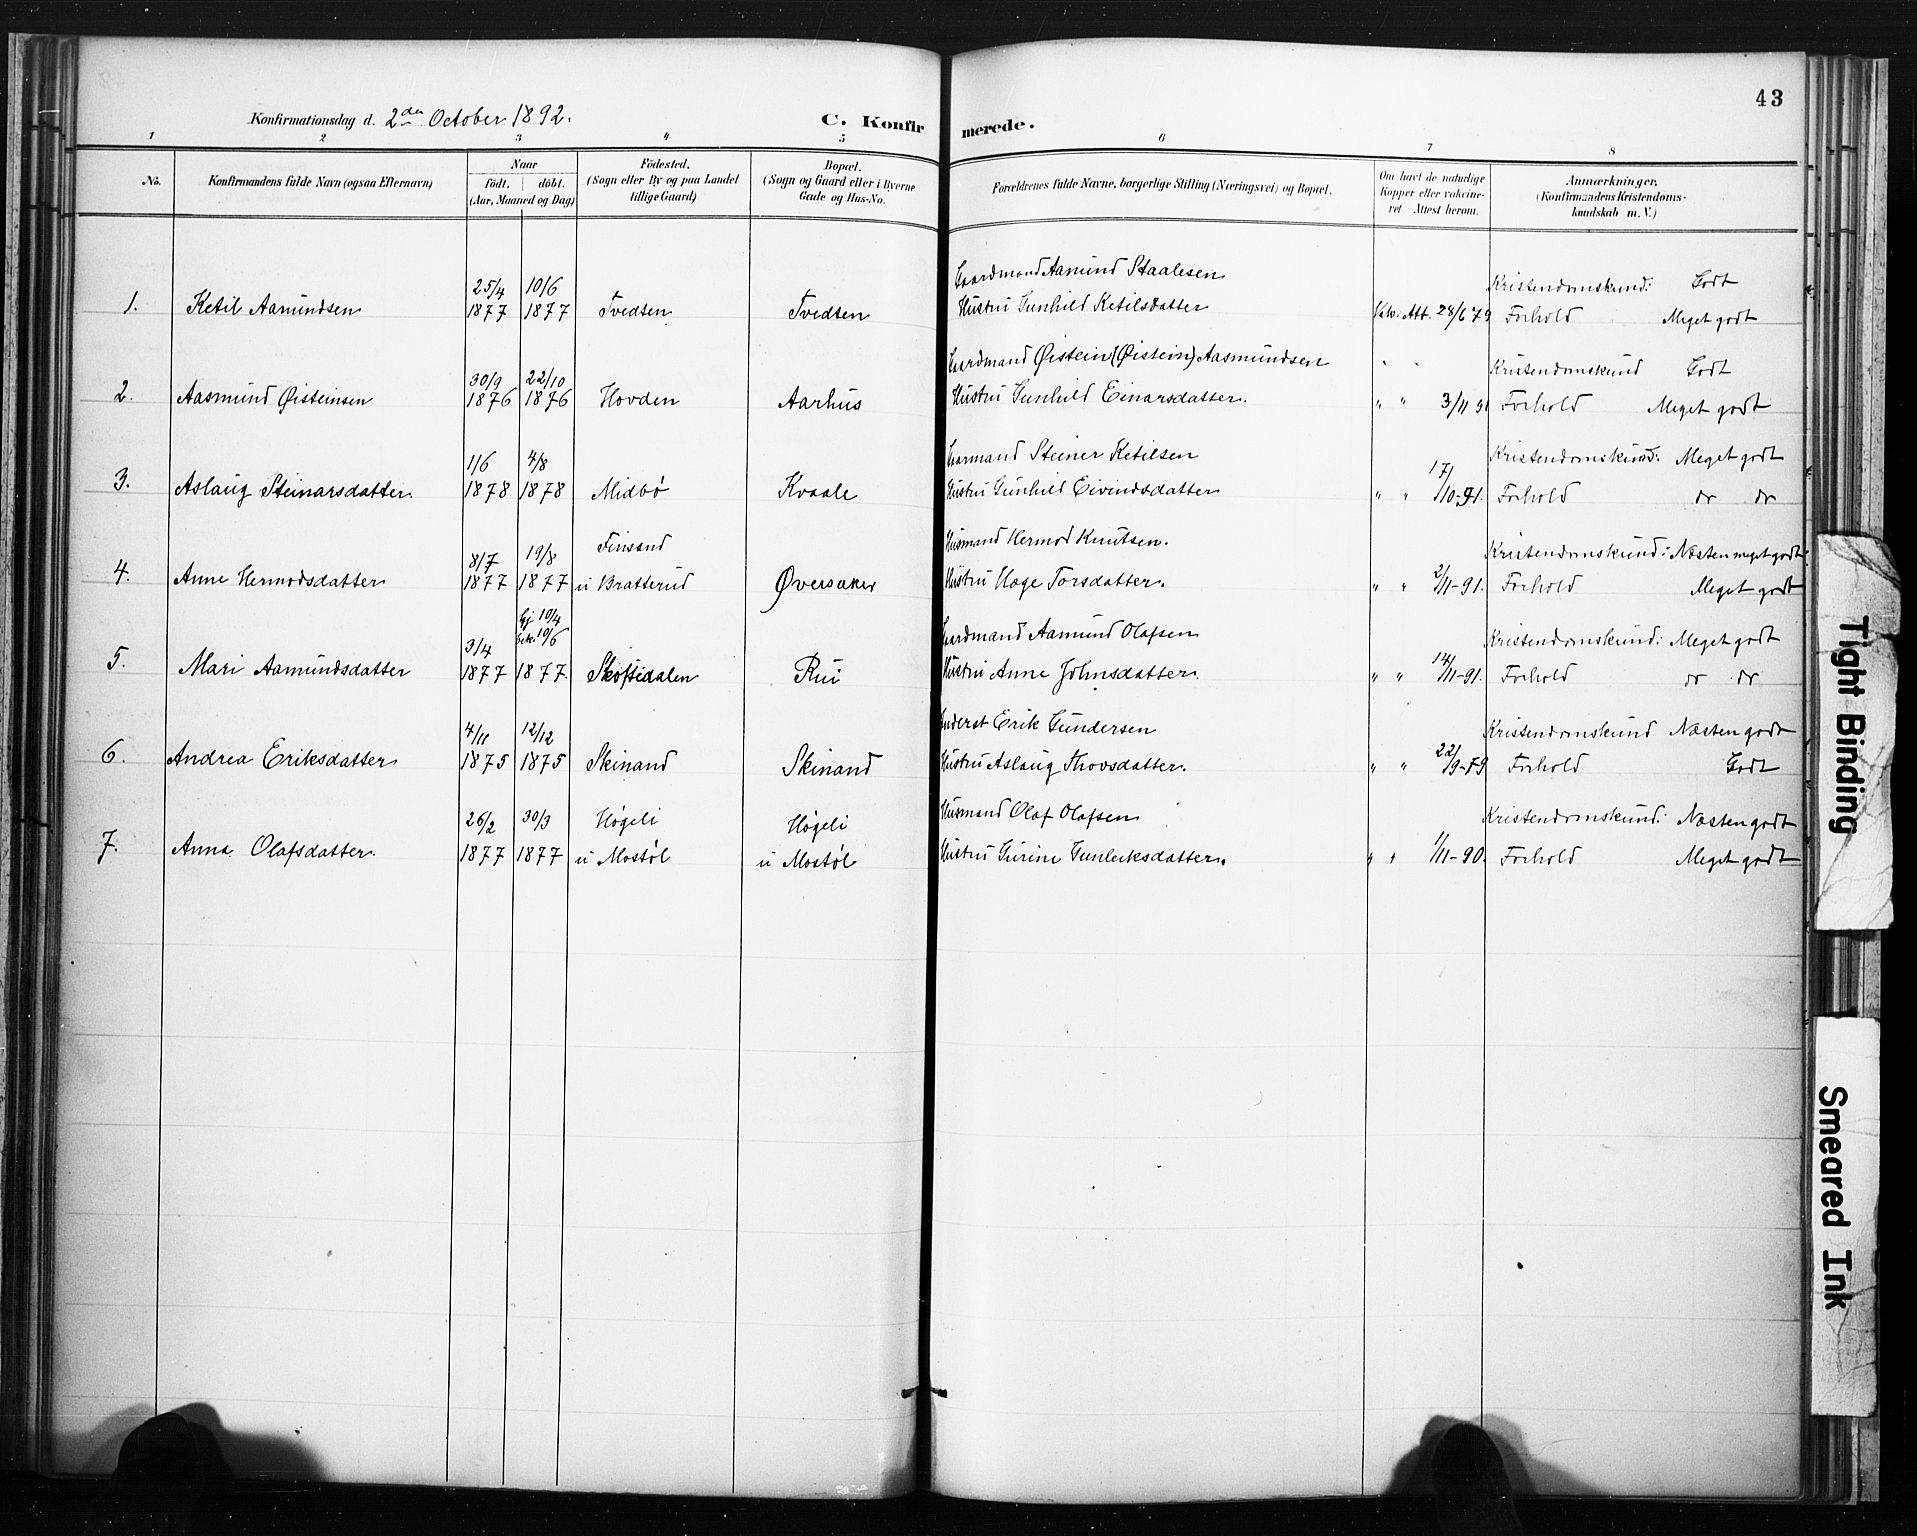 SAKO, Lårdal kirkebøker, F/Fc/L0002: Ministerialbok nr. III 2, 1887-1906, s. 43